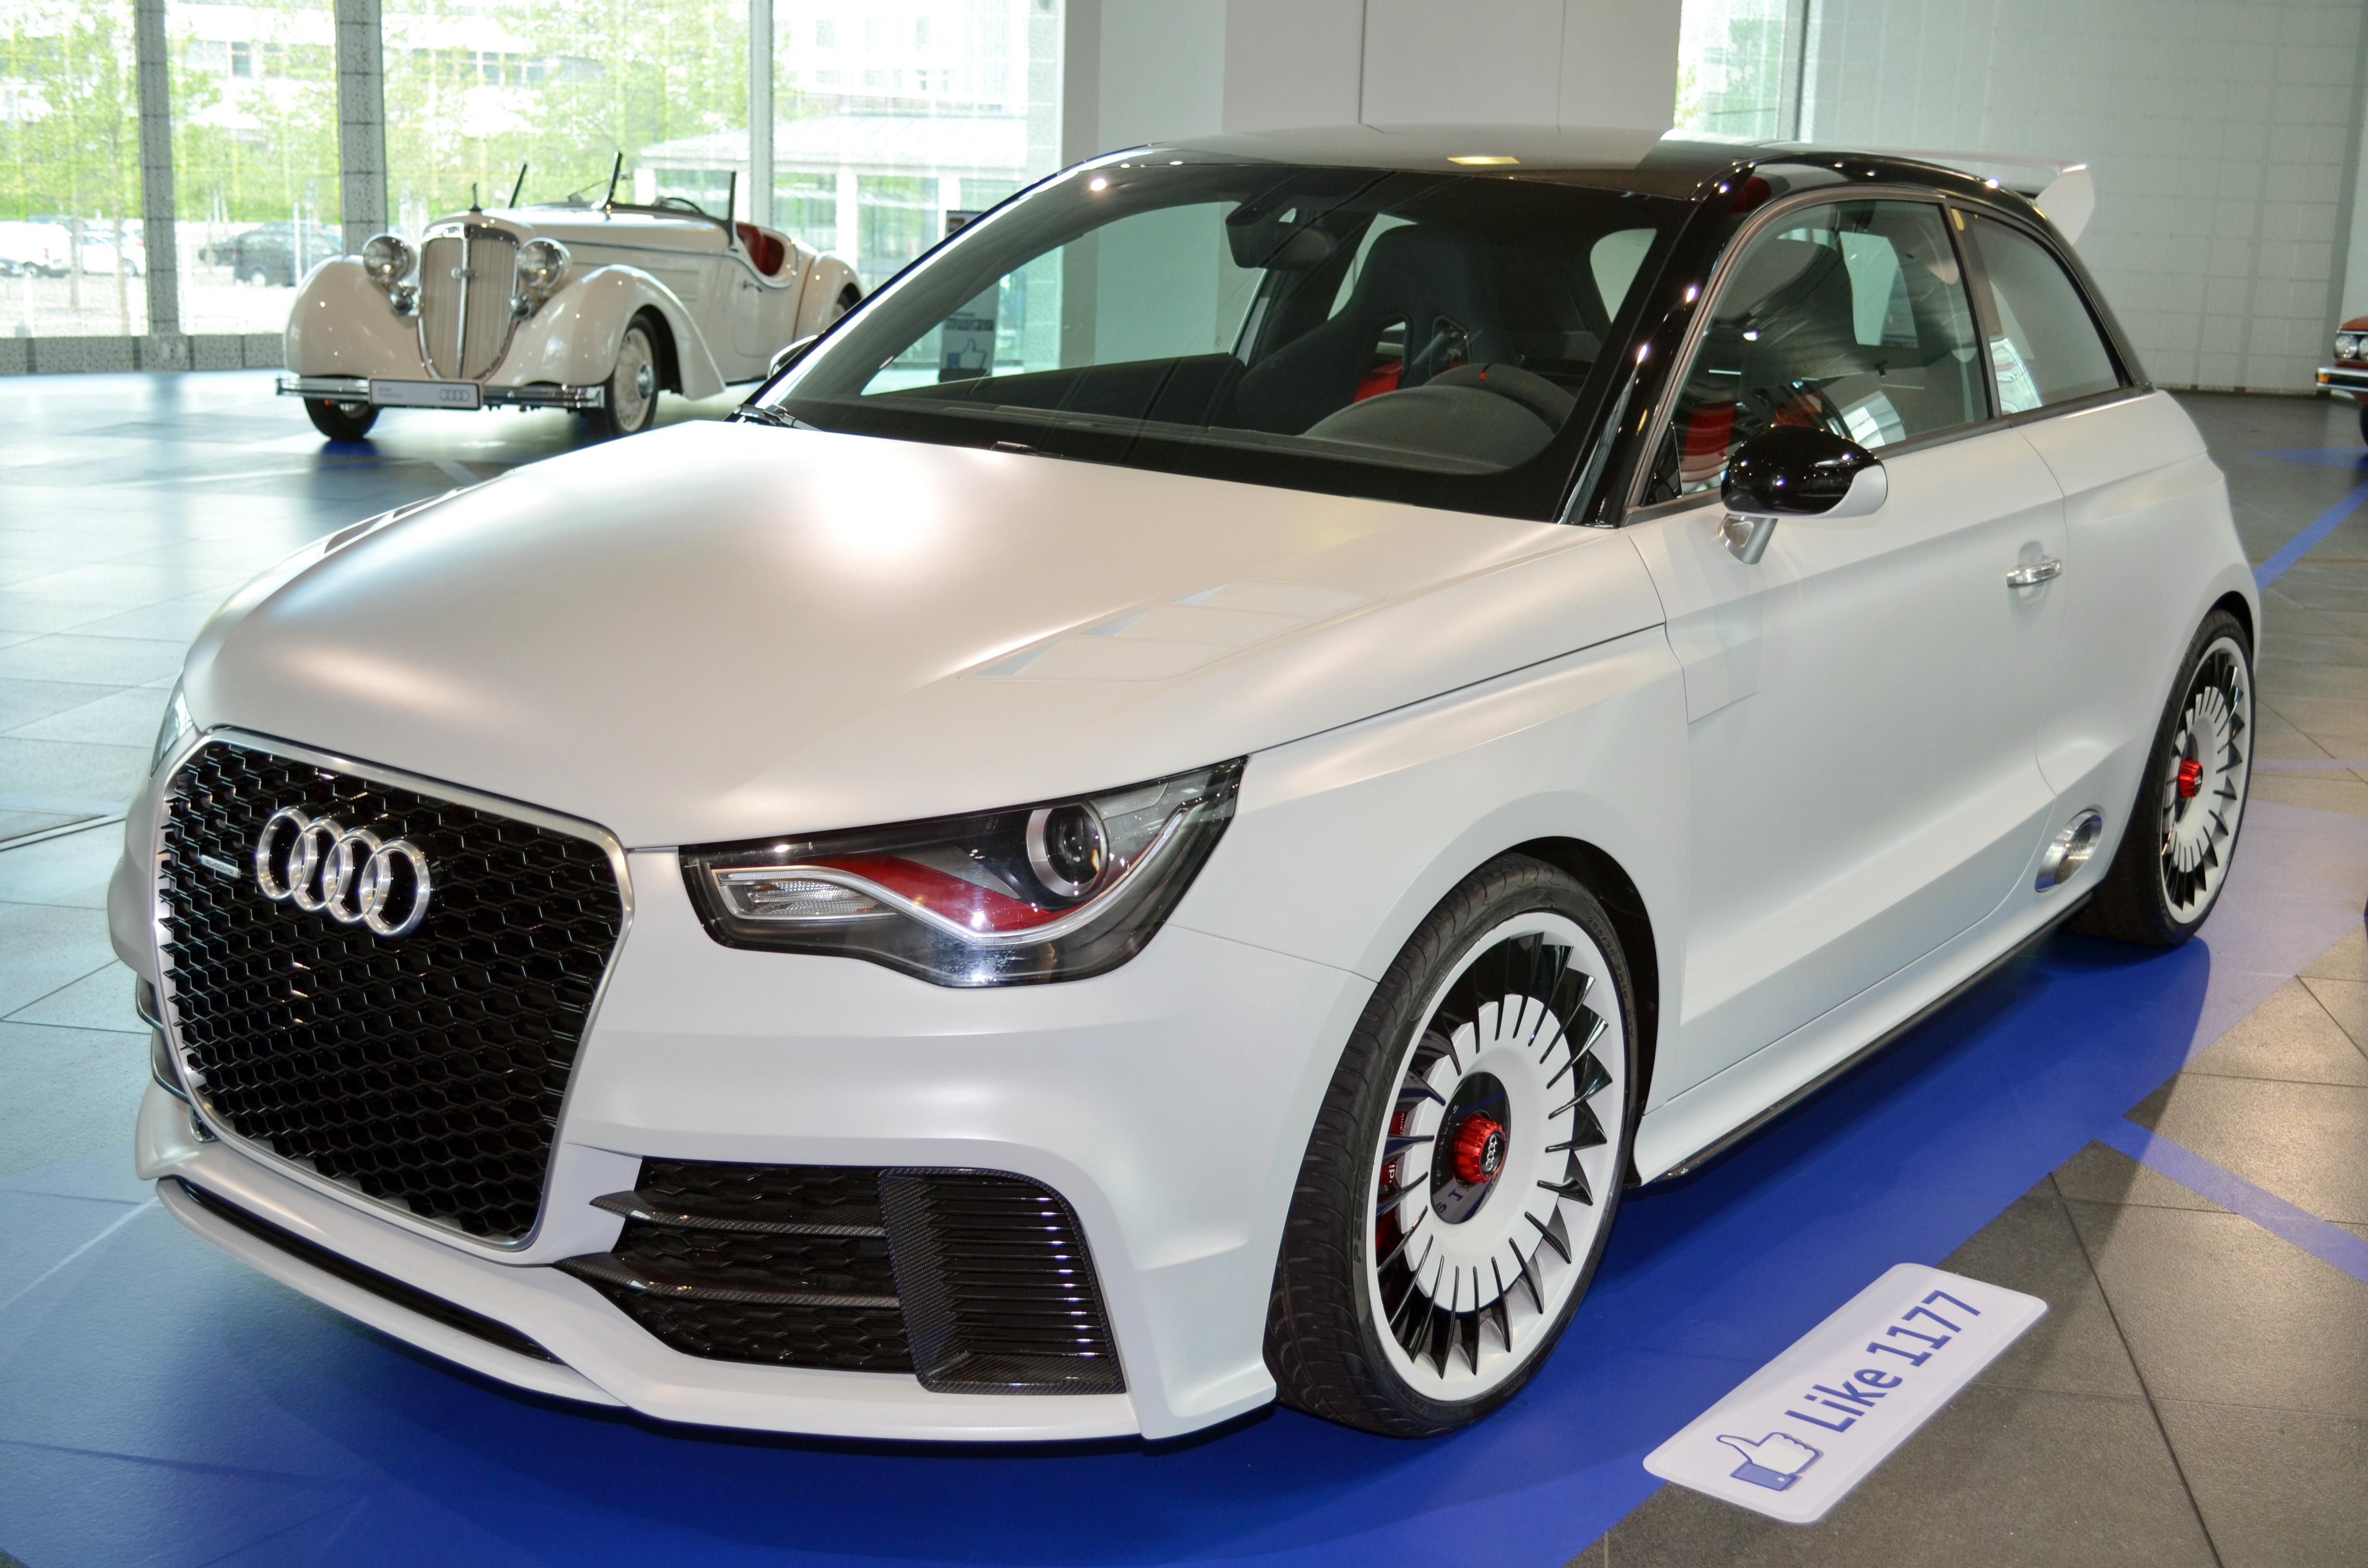 High Resolution Wallpaper | Audi A1 Quattro 4928x3264 px